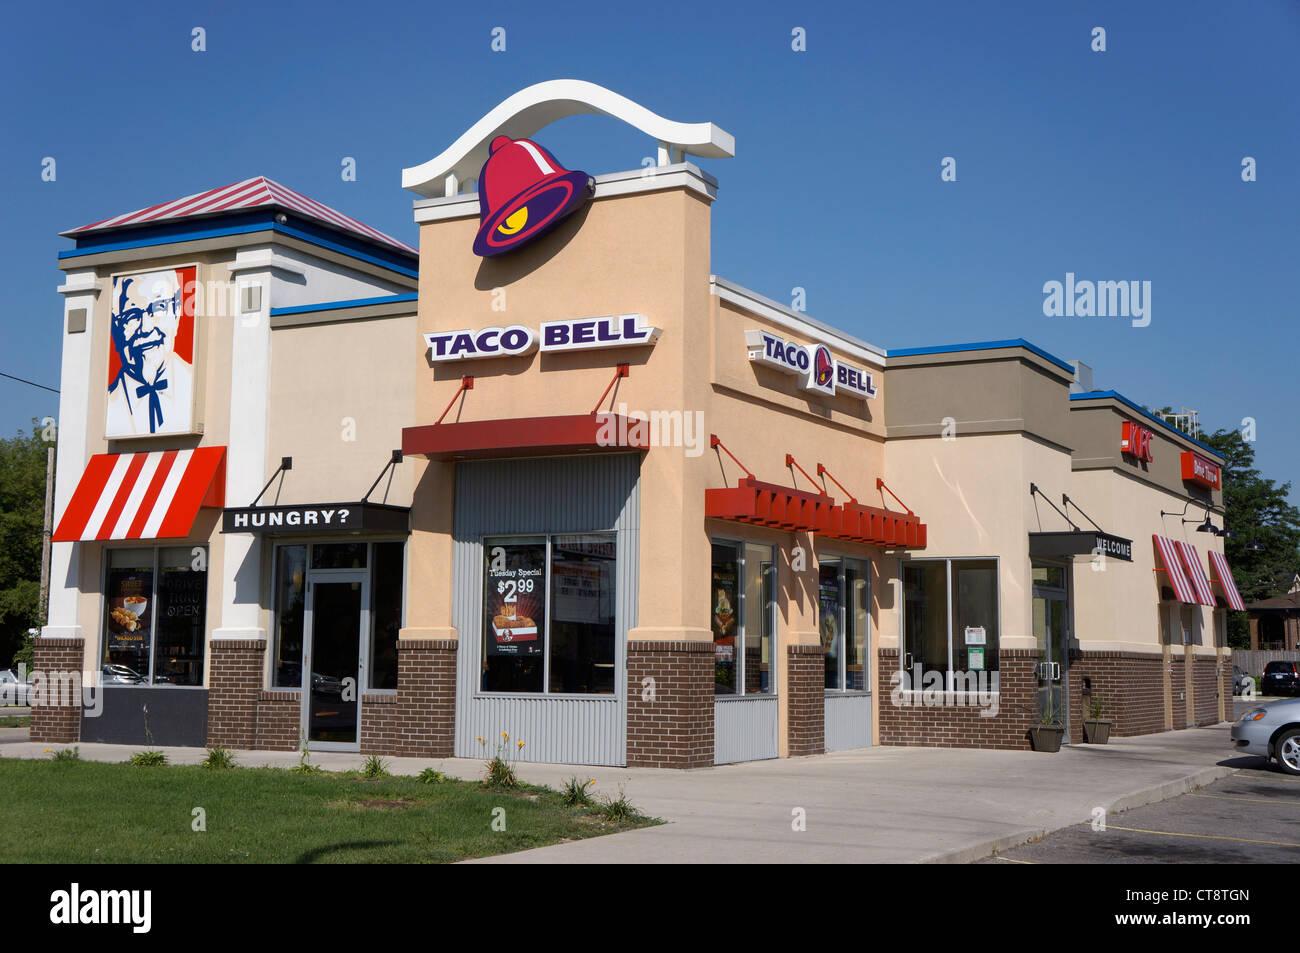 West Branch Mi Fast Food